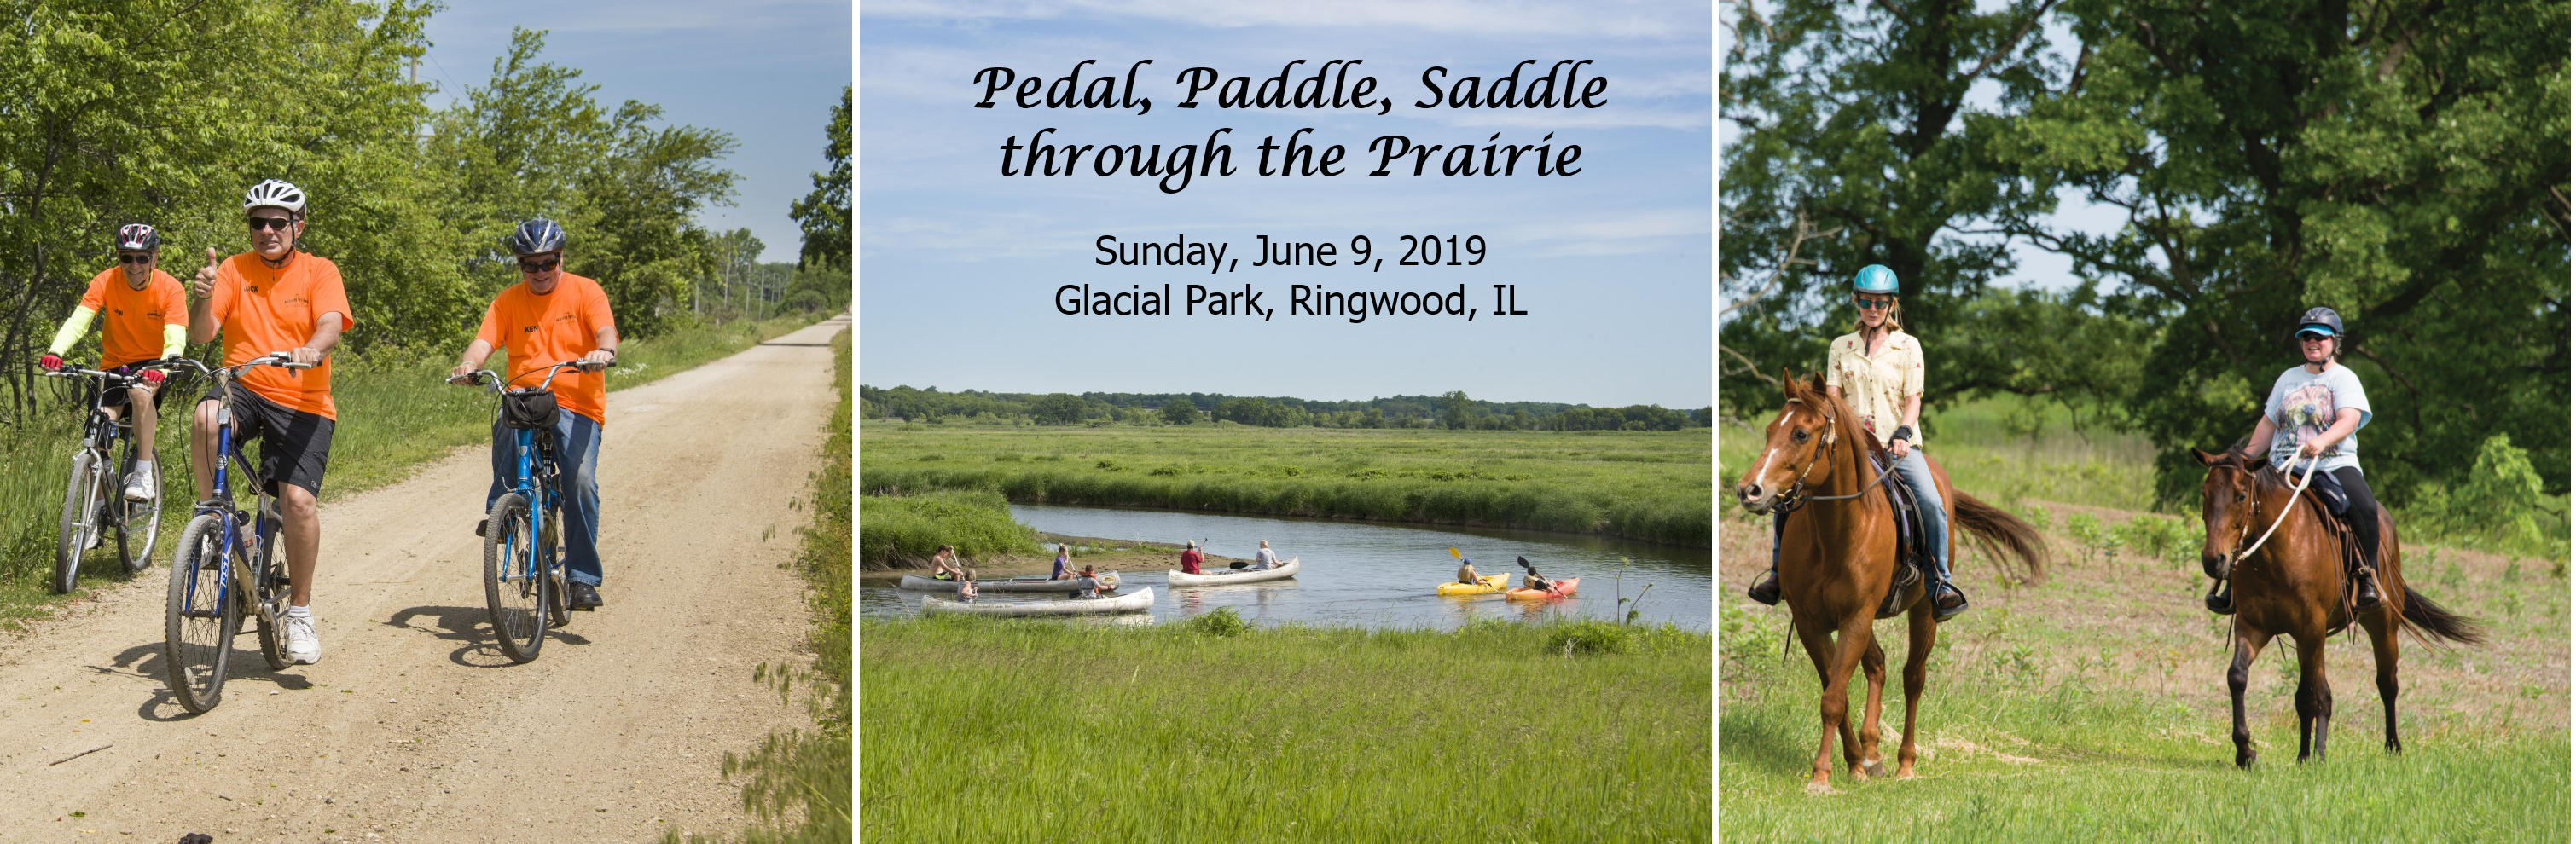 Pedal Paddle Saddle 2019 Registration